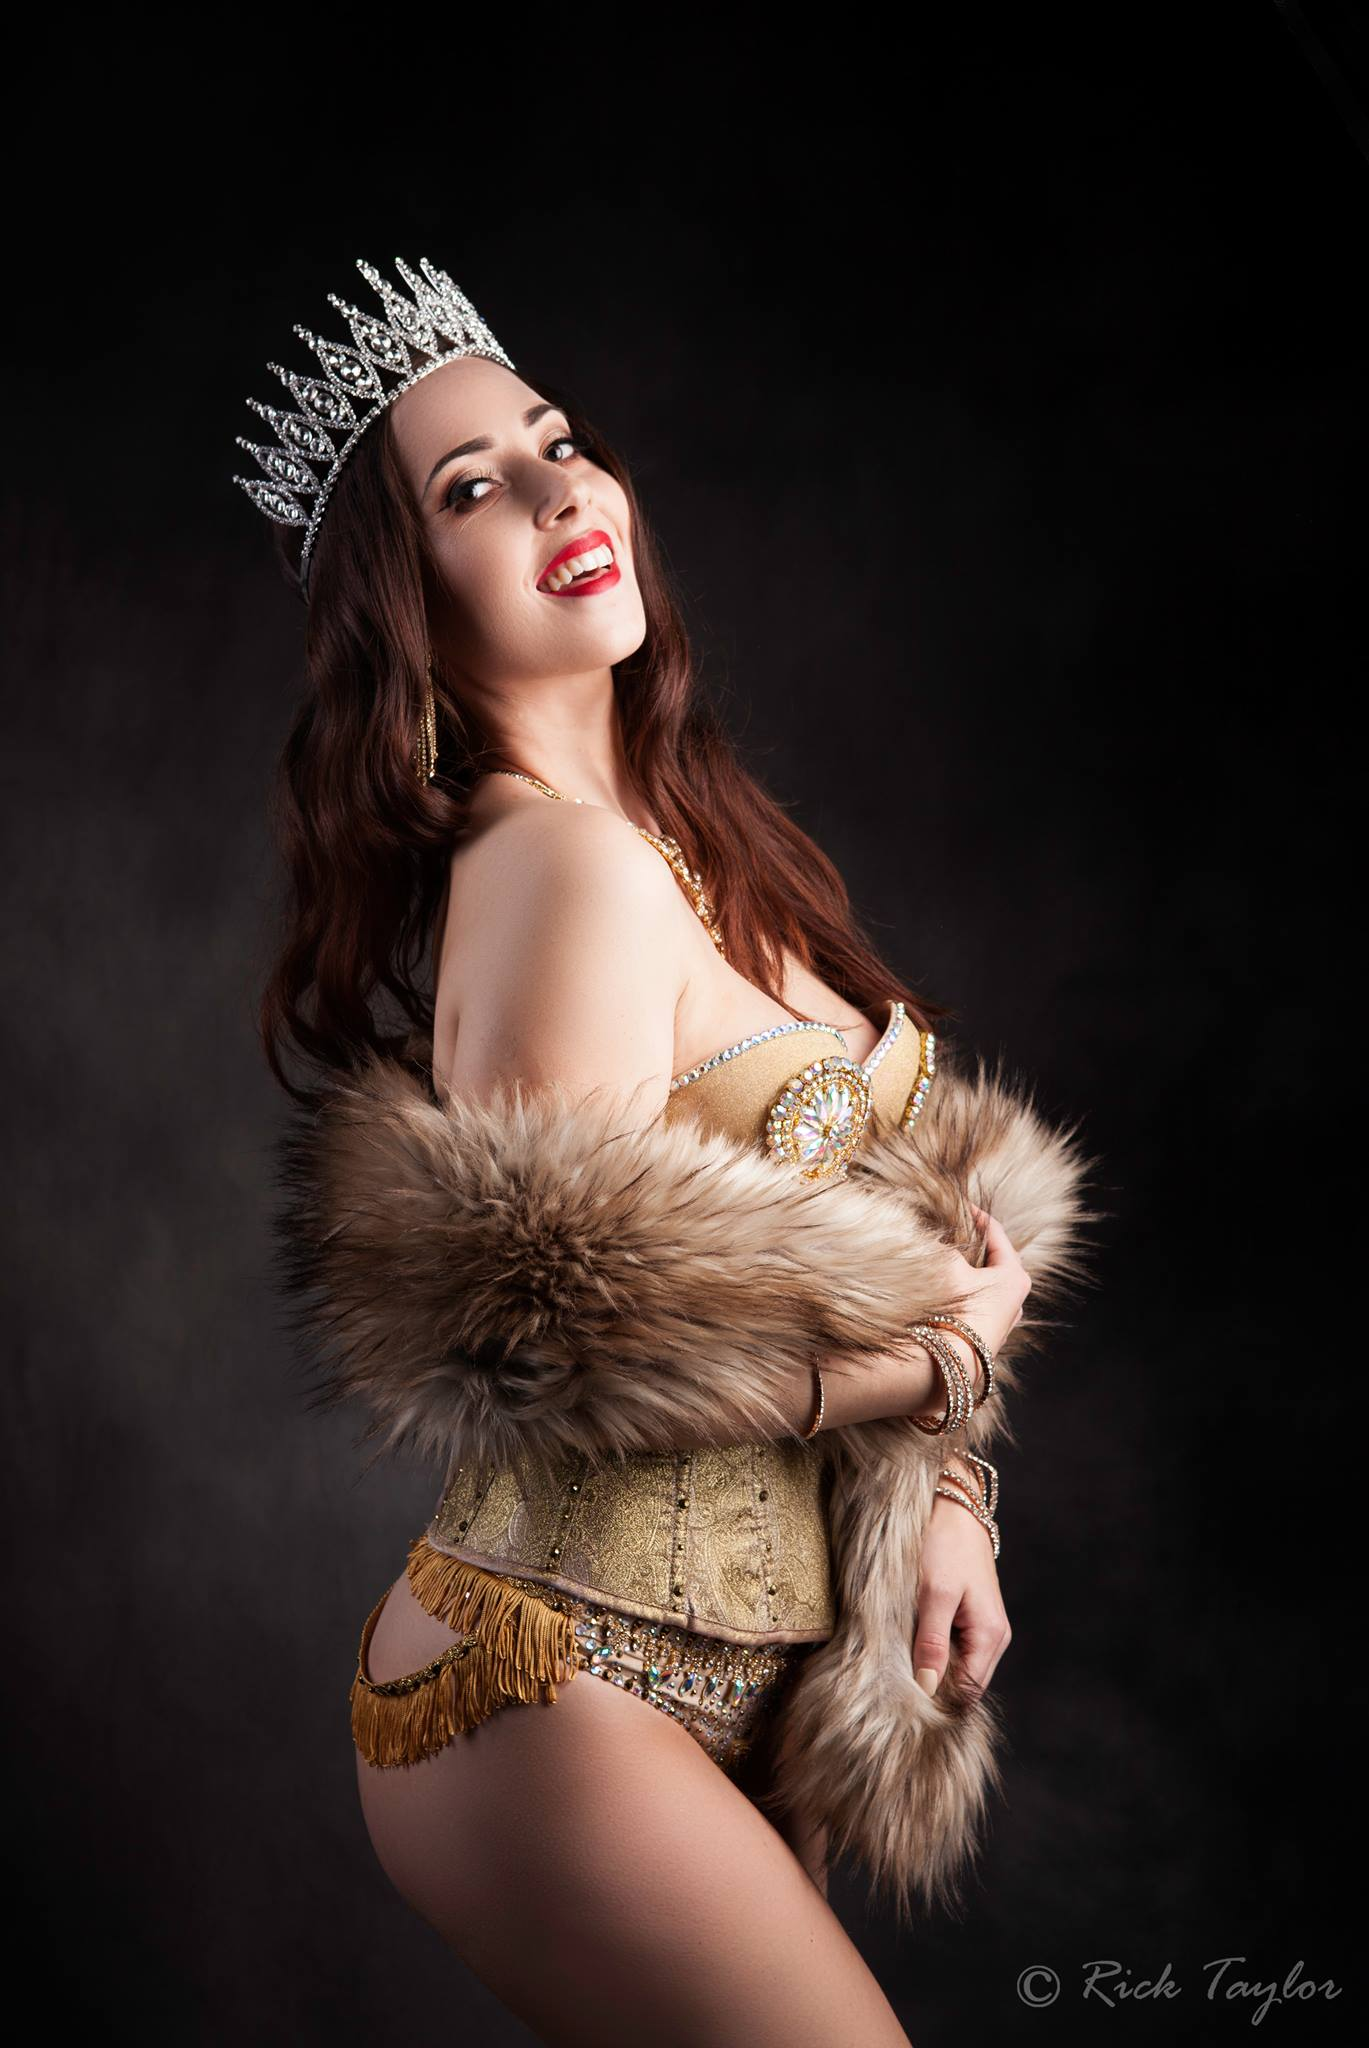 Crown photo Rick Taylor 9 Photography.jpg